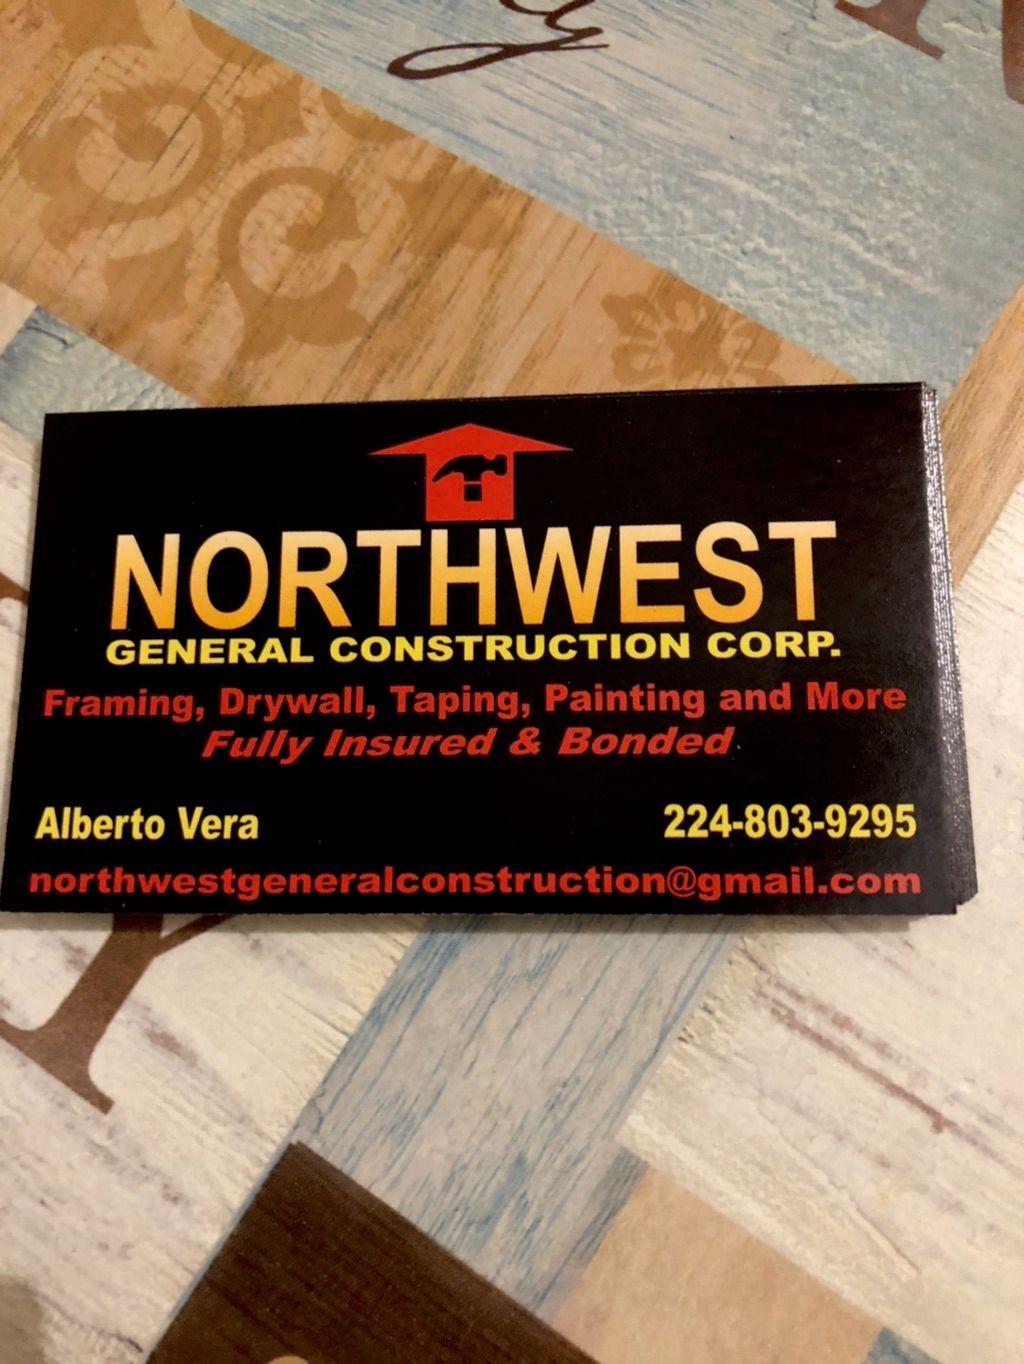 Northwest General Construction Corp